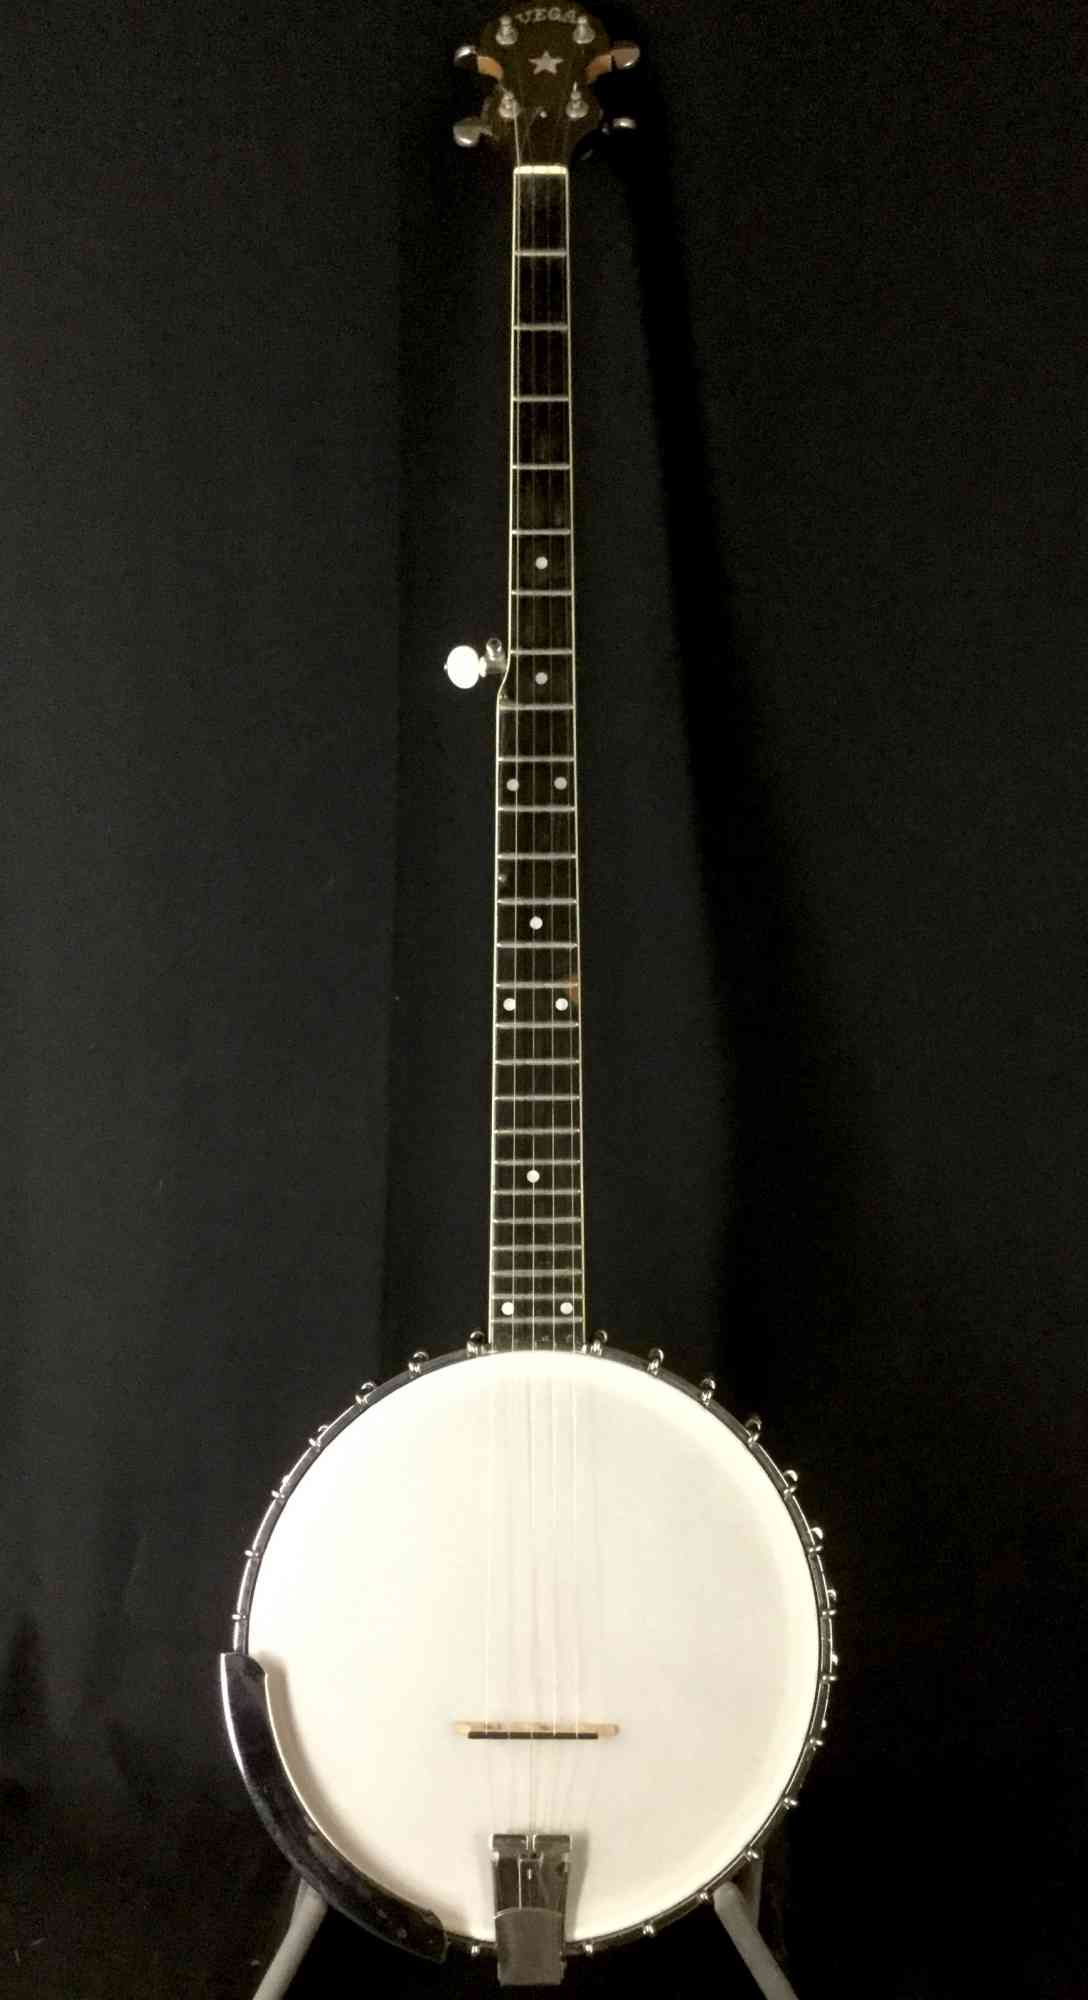 Vega Pete Seeger Long Neck Banjo 1960 . Click to enlarge